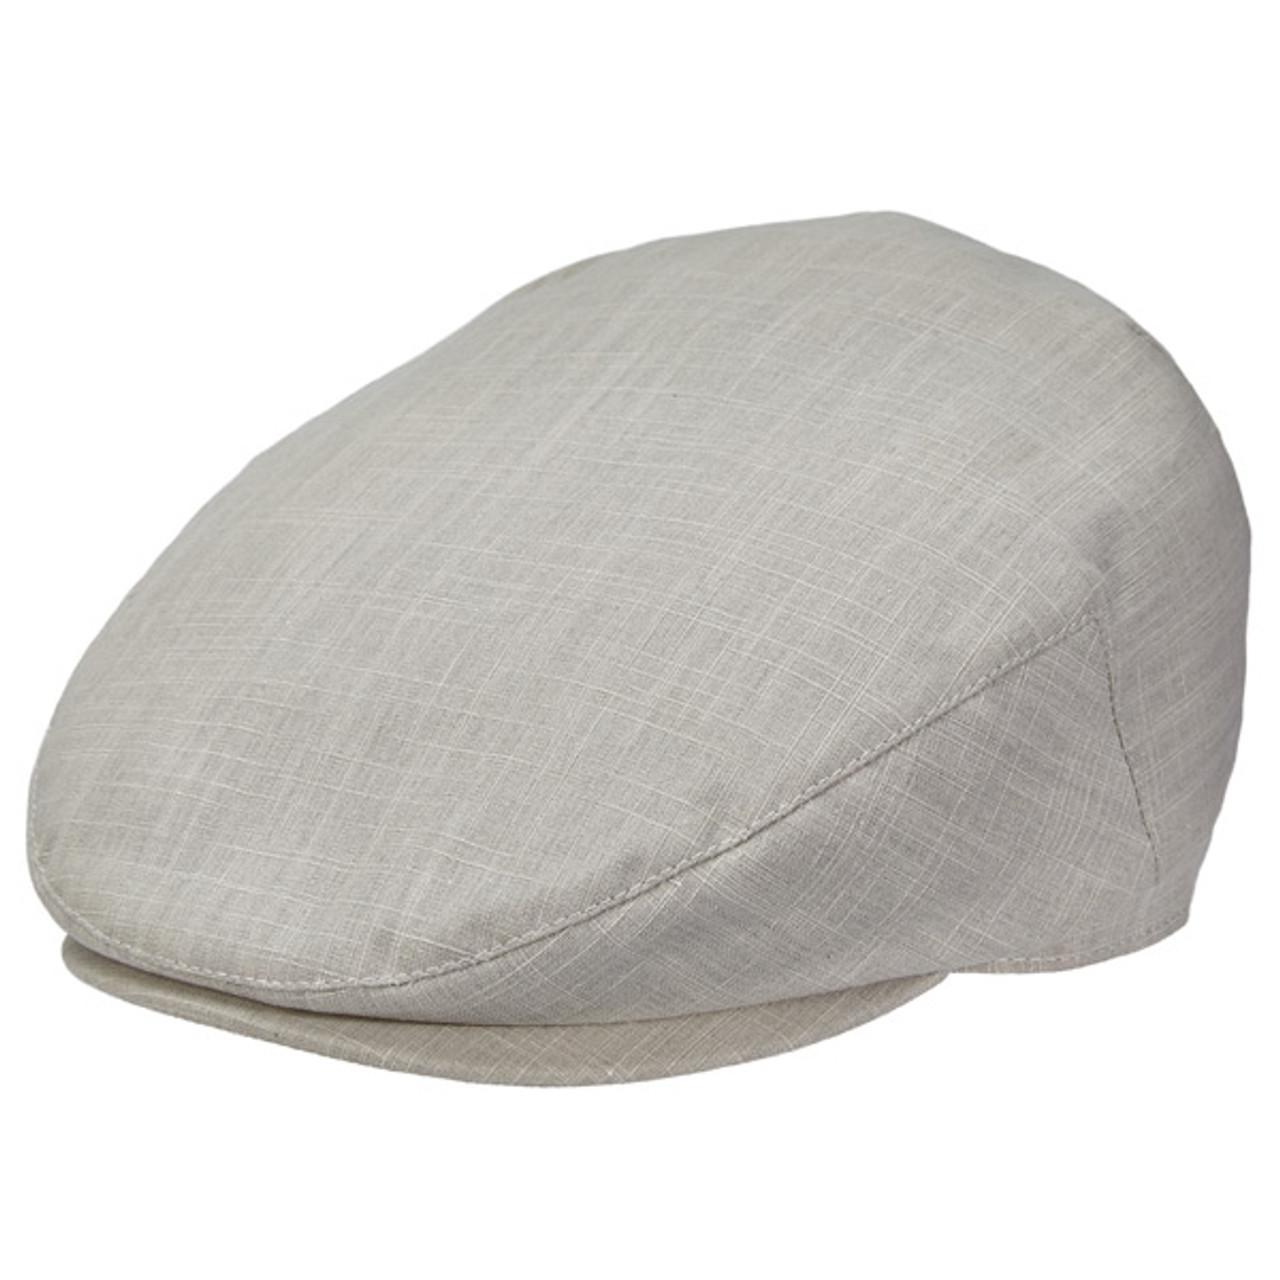 755224826fa2fb Stetson | Cotton Ivy Flat Cap | Hats Unlimited